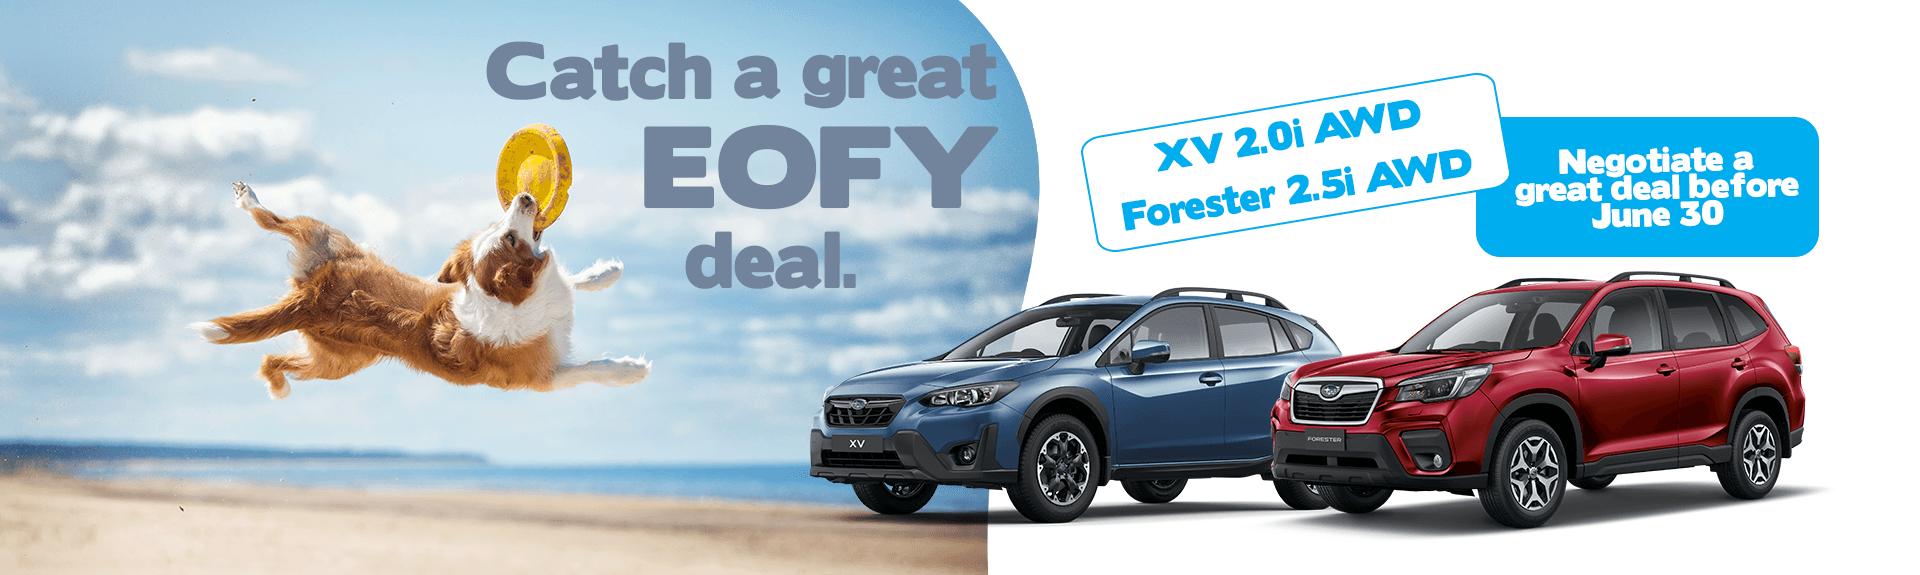 Ryde Subaru Forester Subaru XV, catch a great EOFY deal